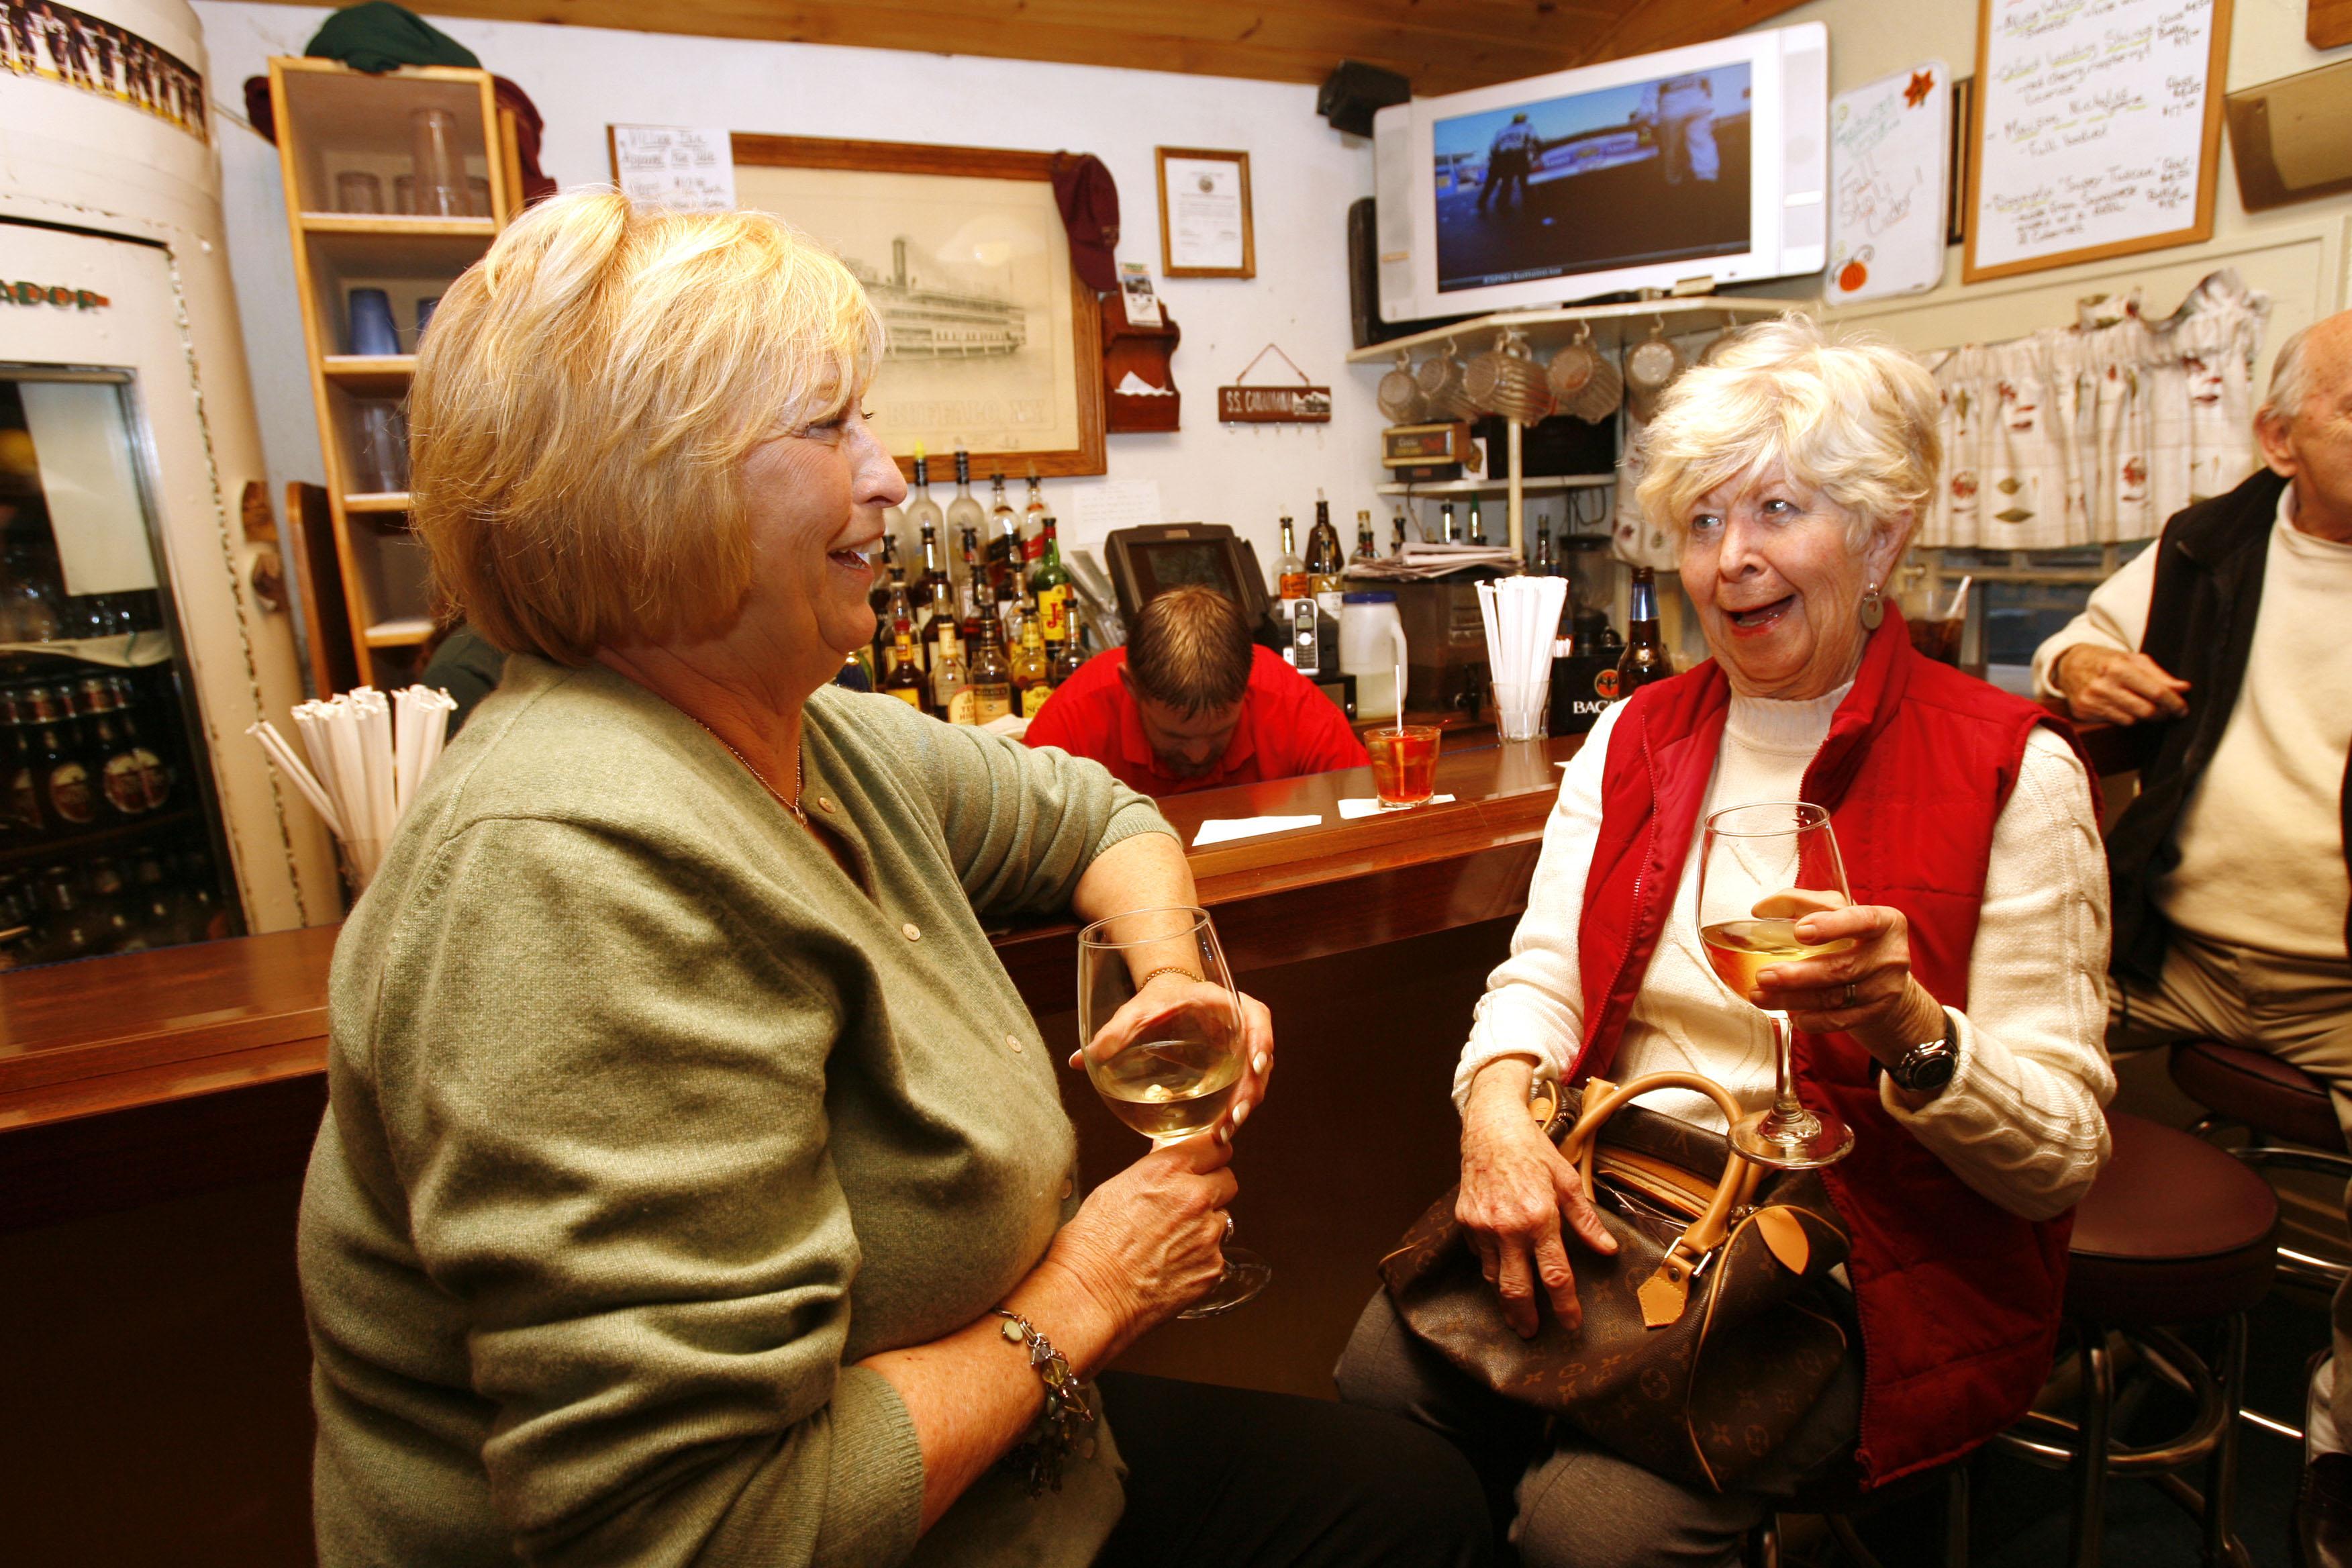 The Bevador at the Village Inn on Grand Island. (Sharon Cantillon/Buffalo News)